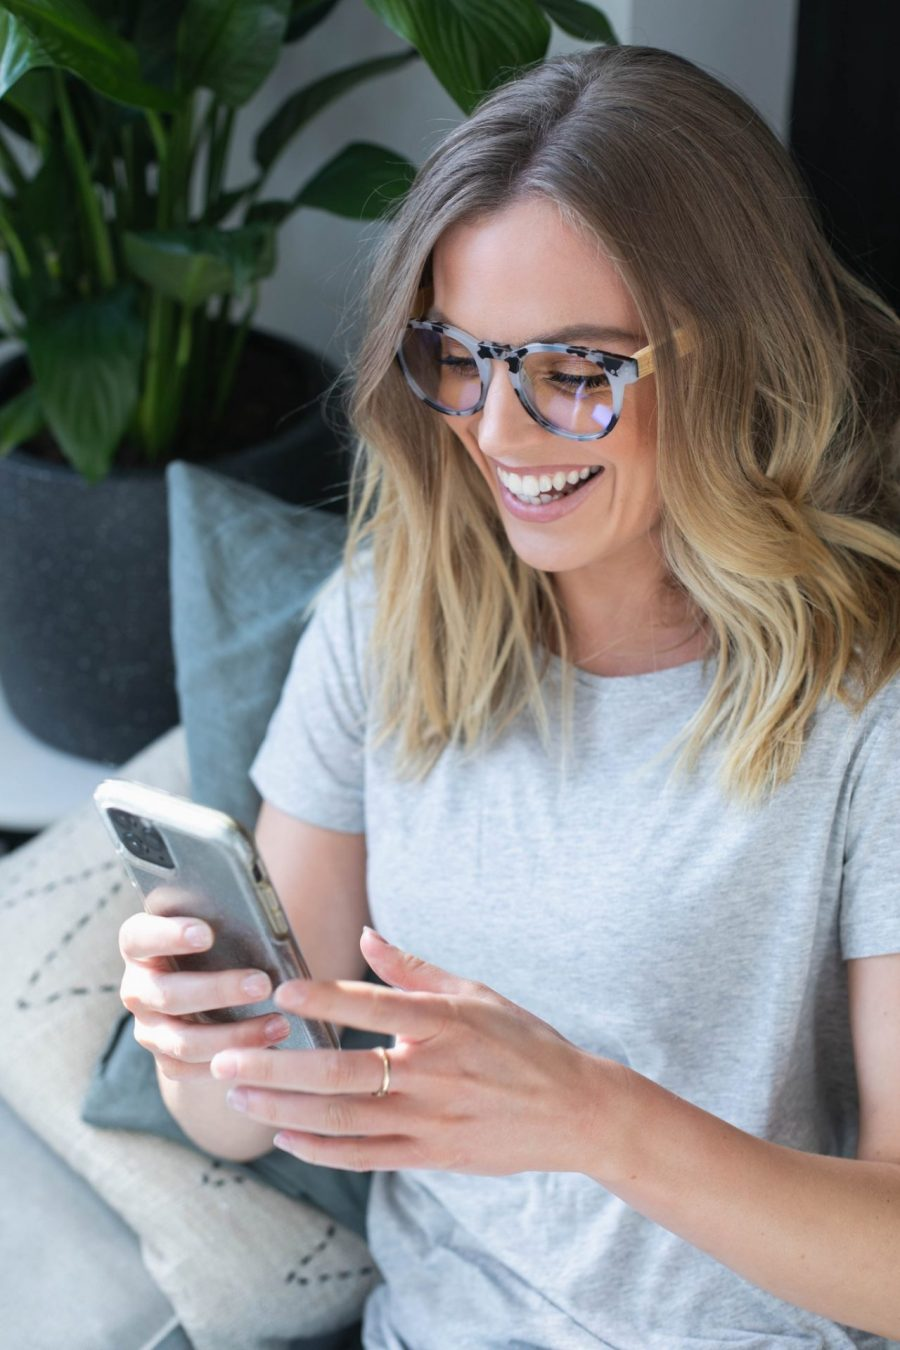 Digital Marble glasses